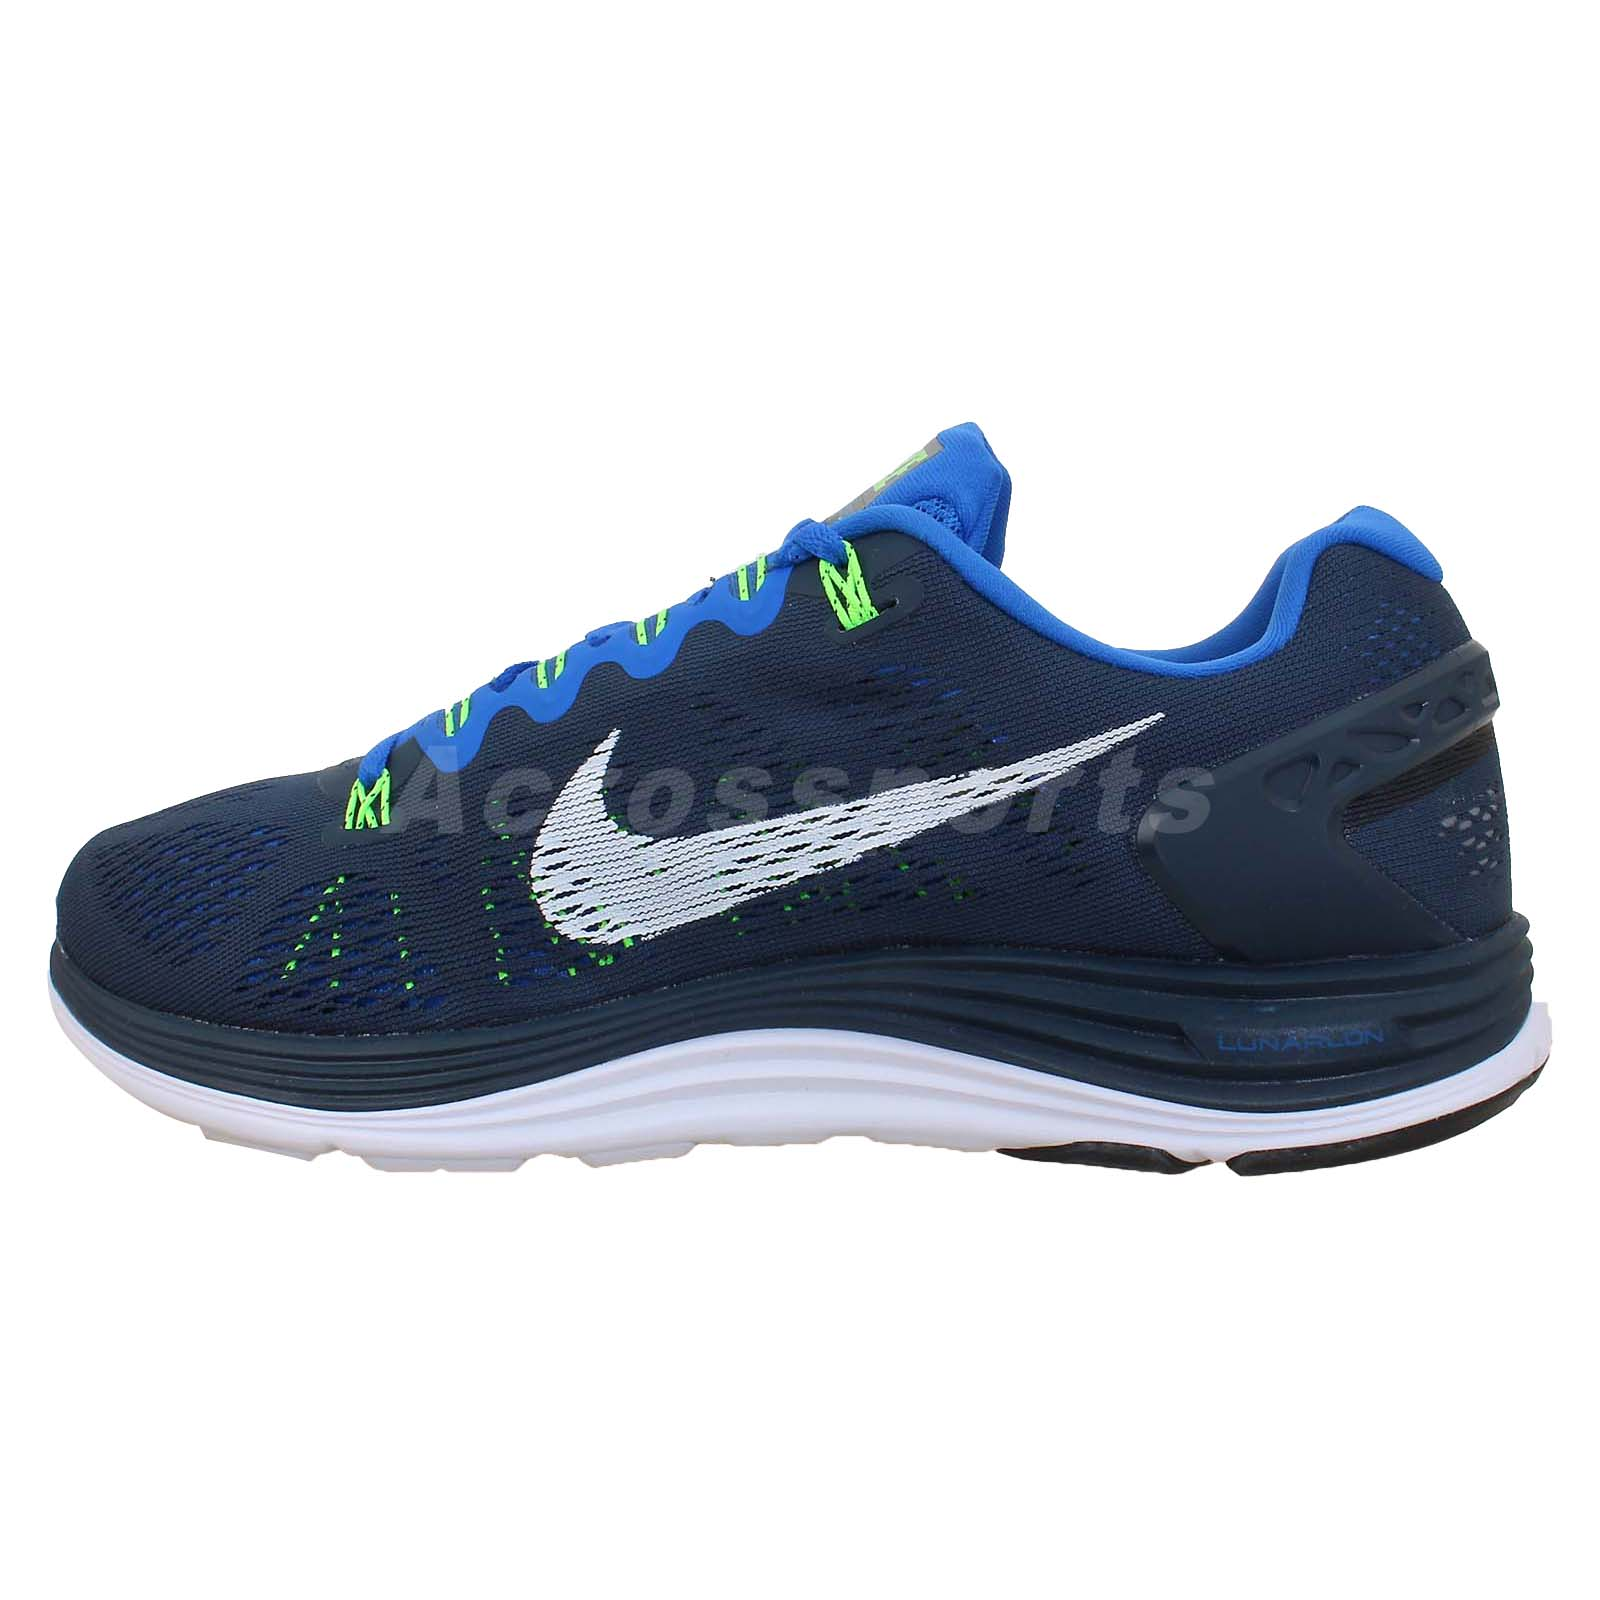 bedd39aeec6c1d Nike Lunarglide 4 Mens Amazon Sale